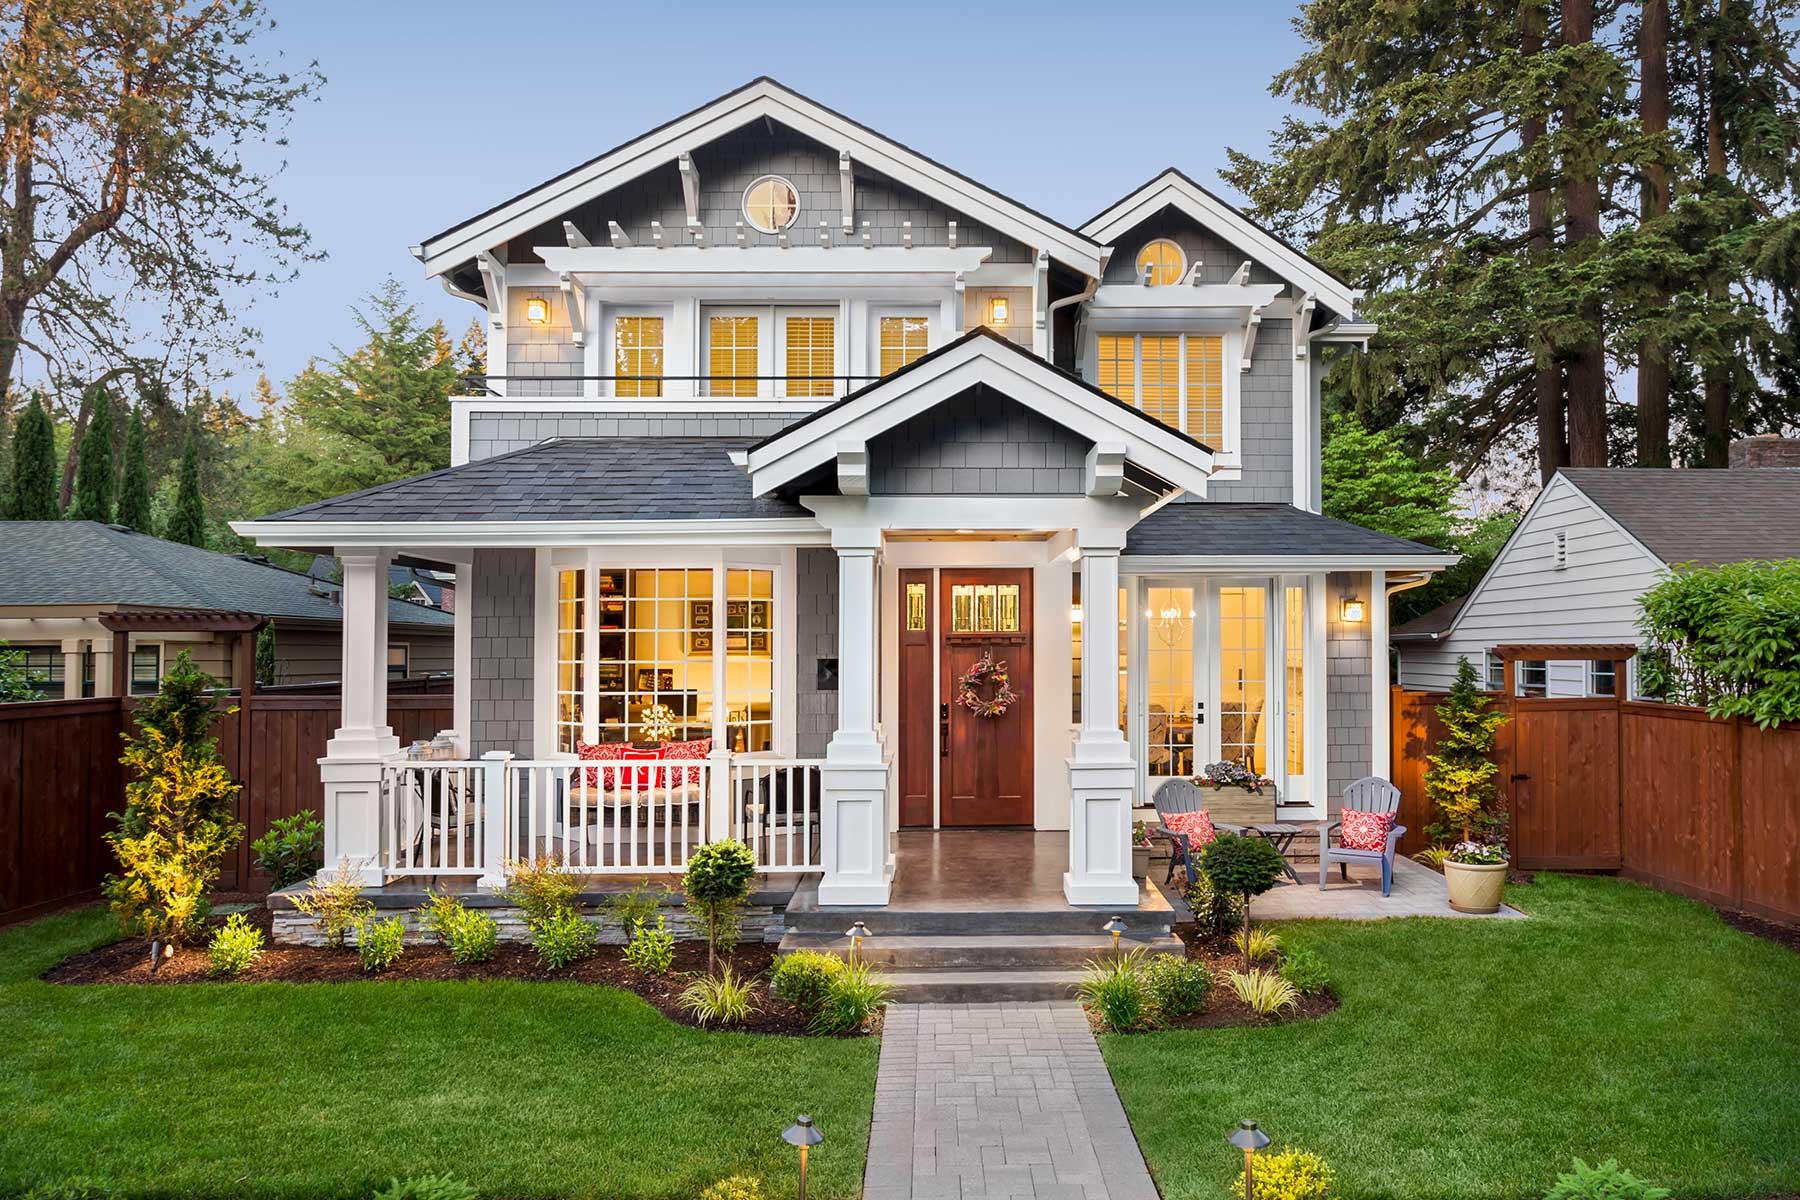 house_image